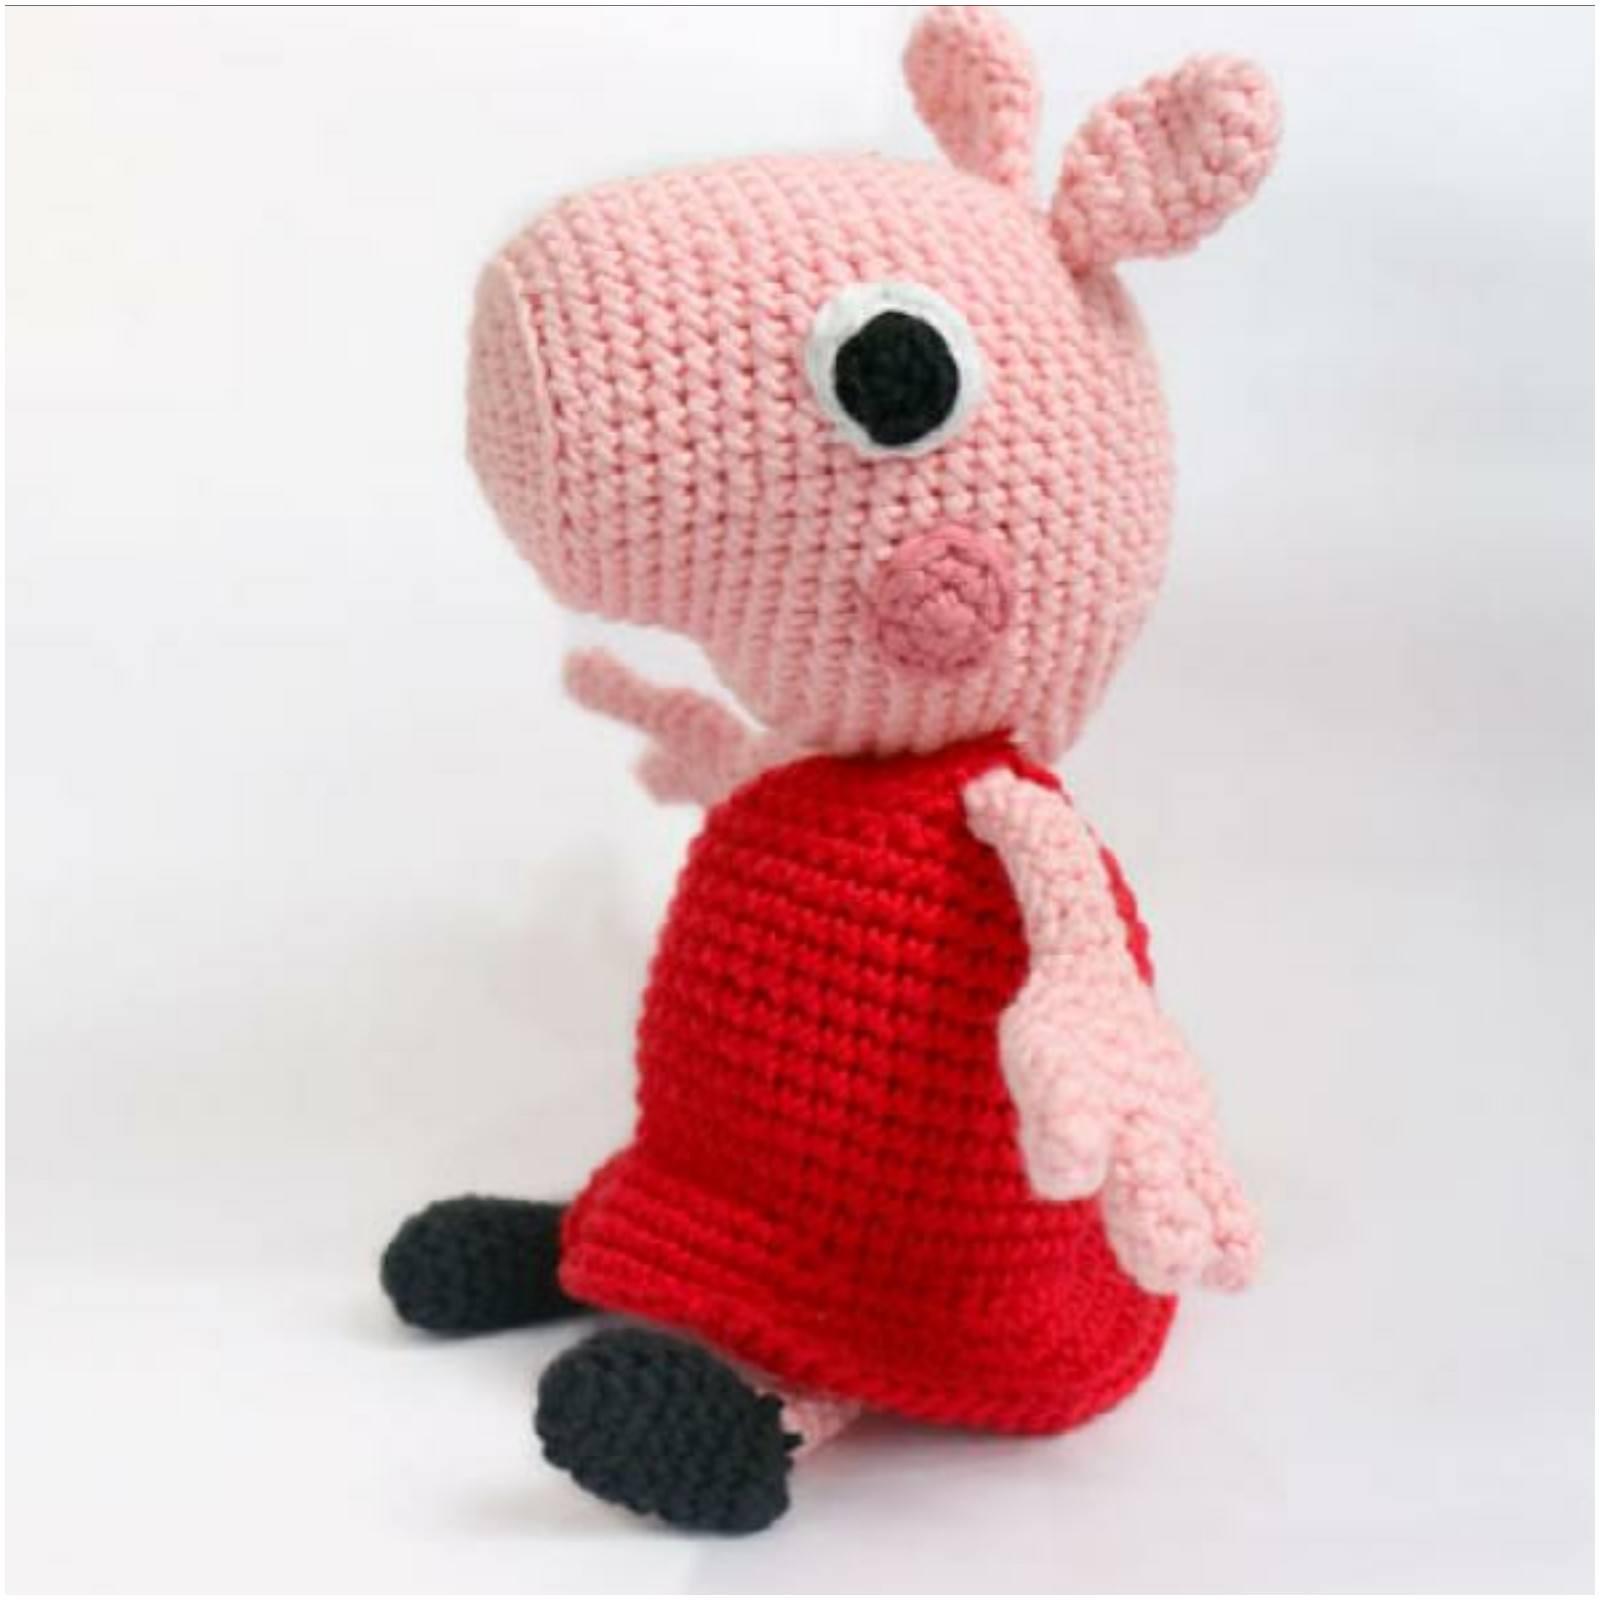 Peppa Pig - free crochet pattern | Crochet pig, Crochet patterns ... | 1600x1600